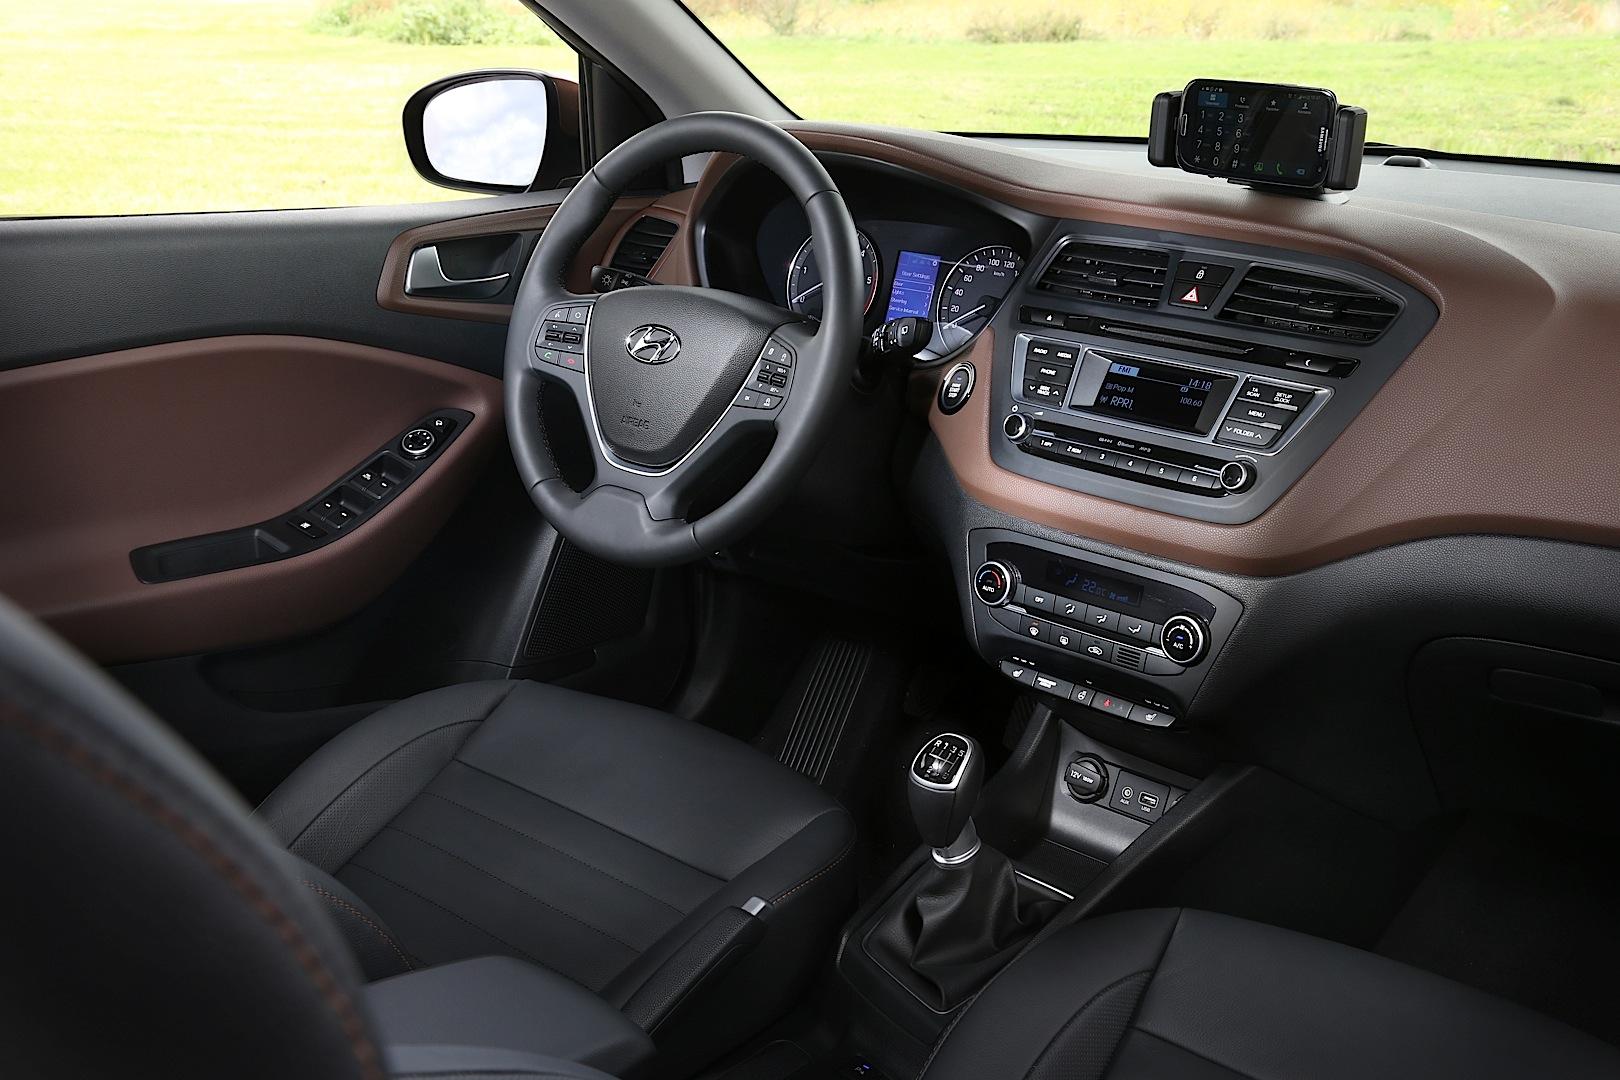 All New Hyundai I20 Interior Detailed Autoevolution